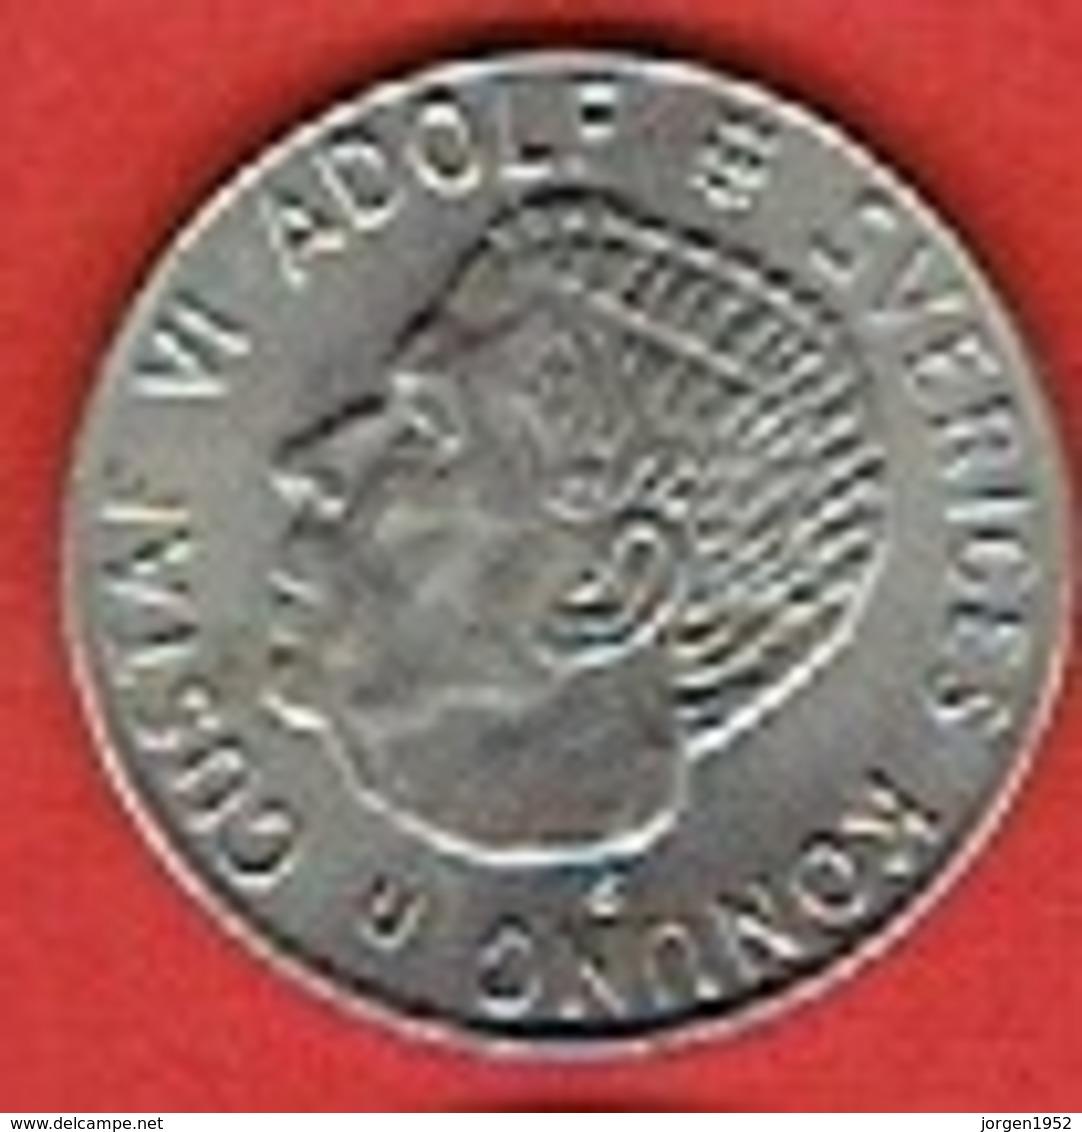 SWEDEN #  1 KRONE FROM 1970 - Suède